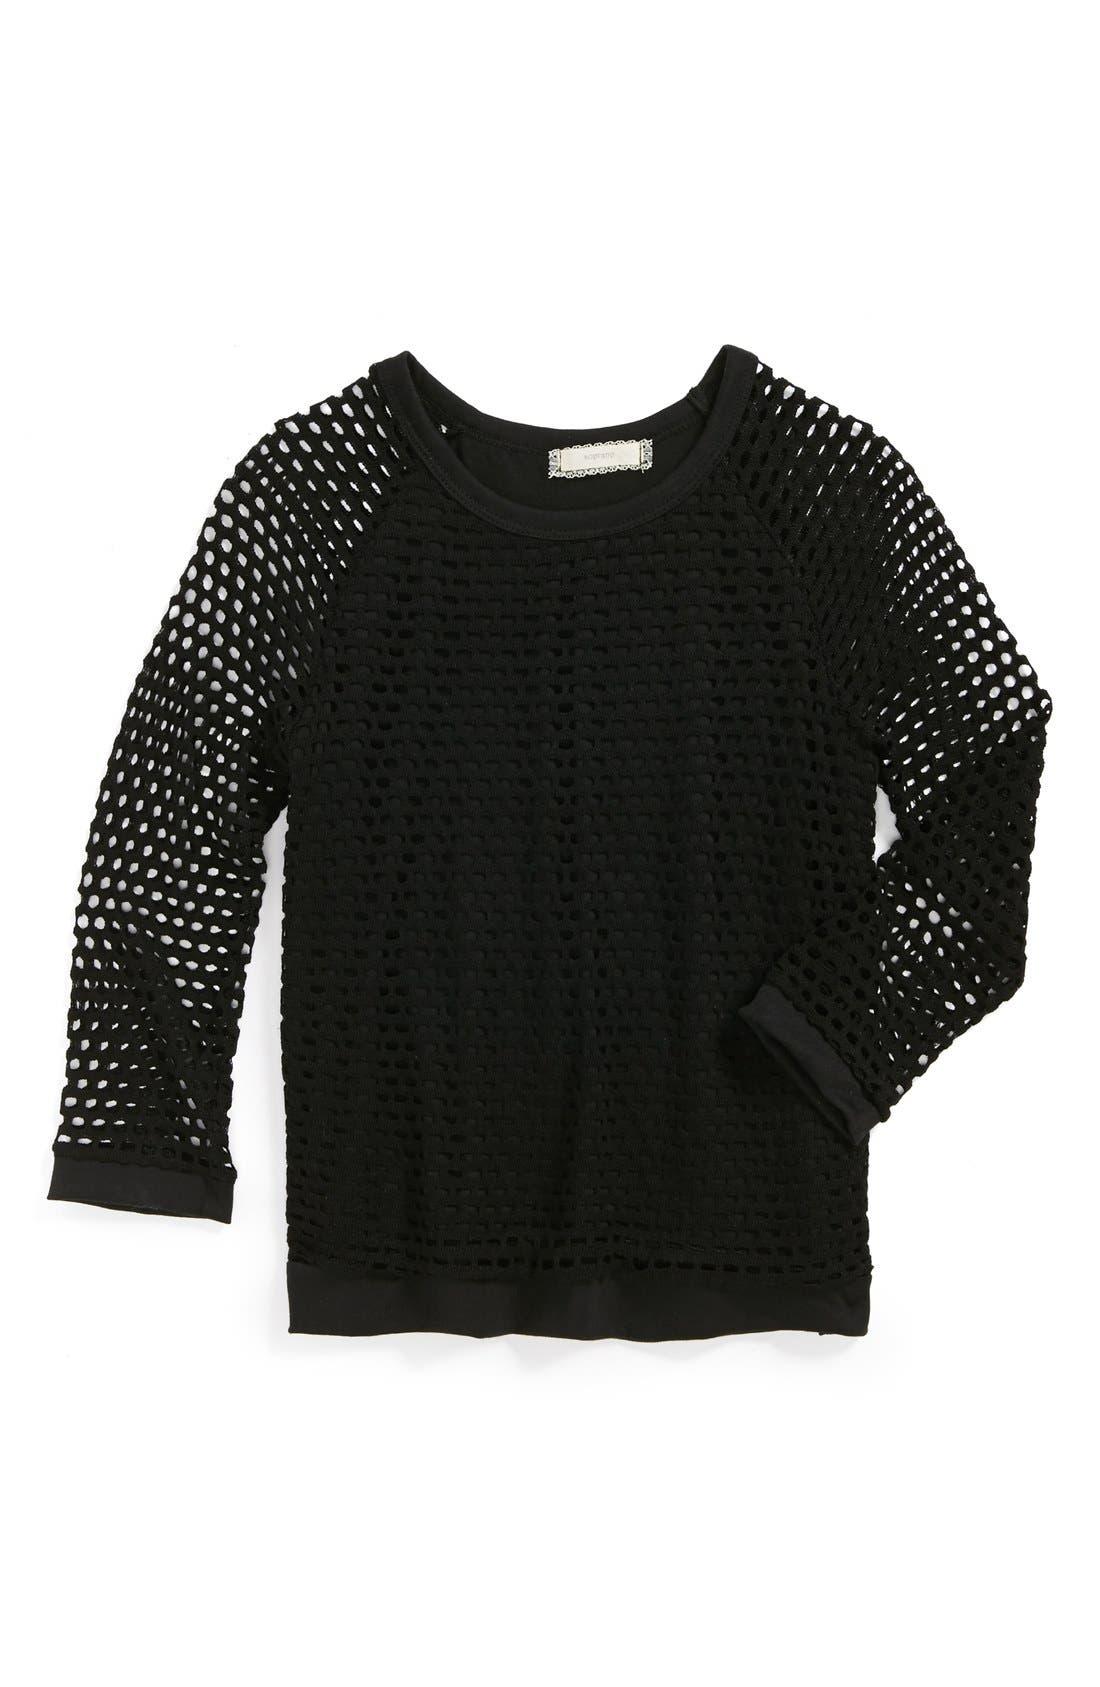 Alternate Image 1 Selected - Soprano Open Weave Sweater (Big Girls)